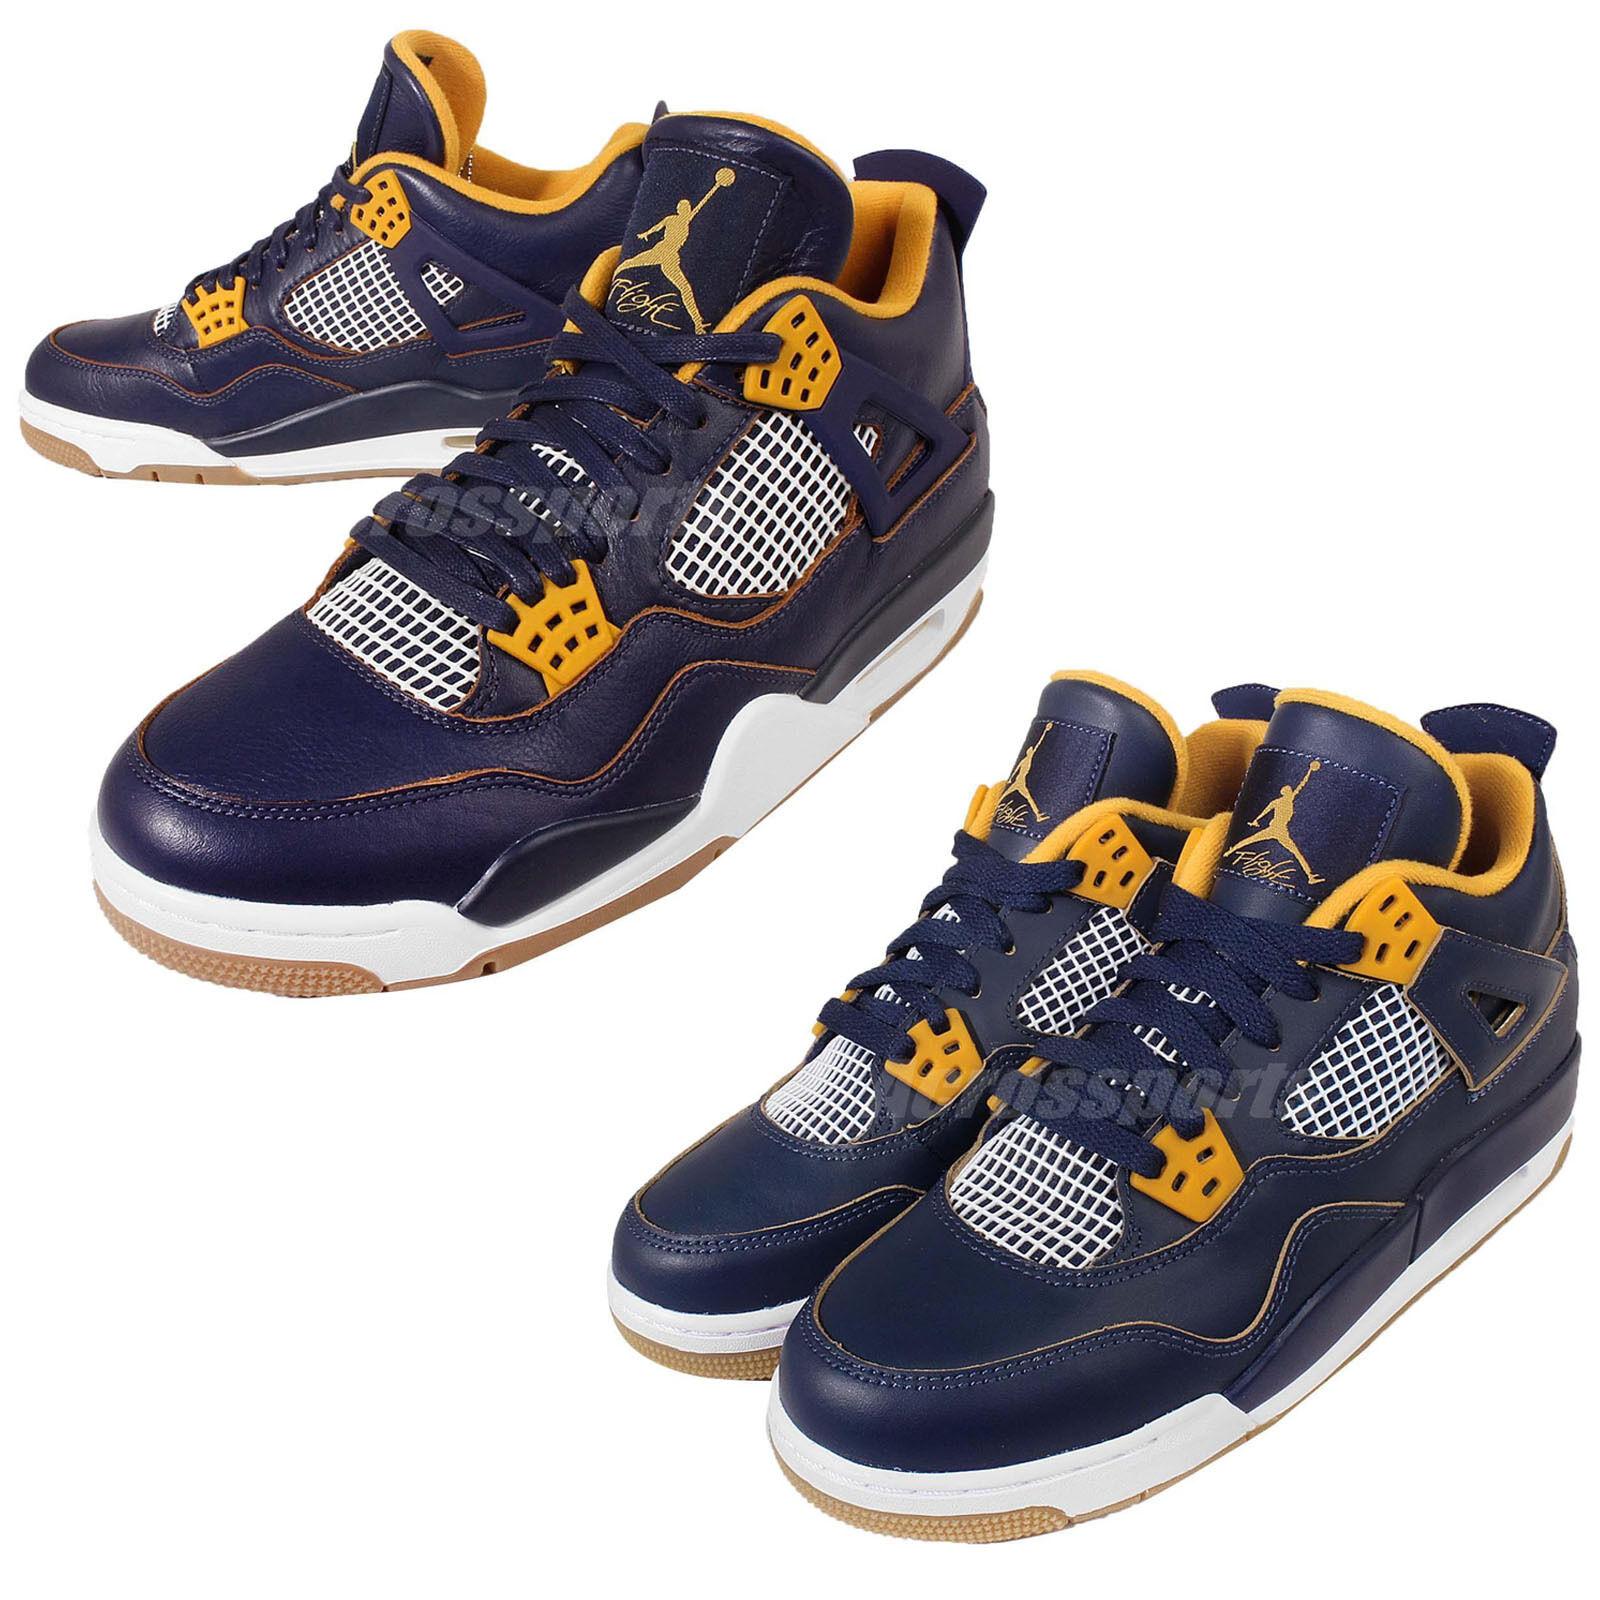 cb39d1aba3fce3 chic Nike Air Jordan 4 IV Retro Dunk From Above Mens 308497-425   Womens